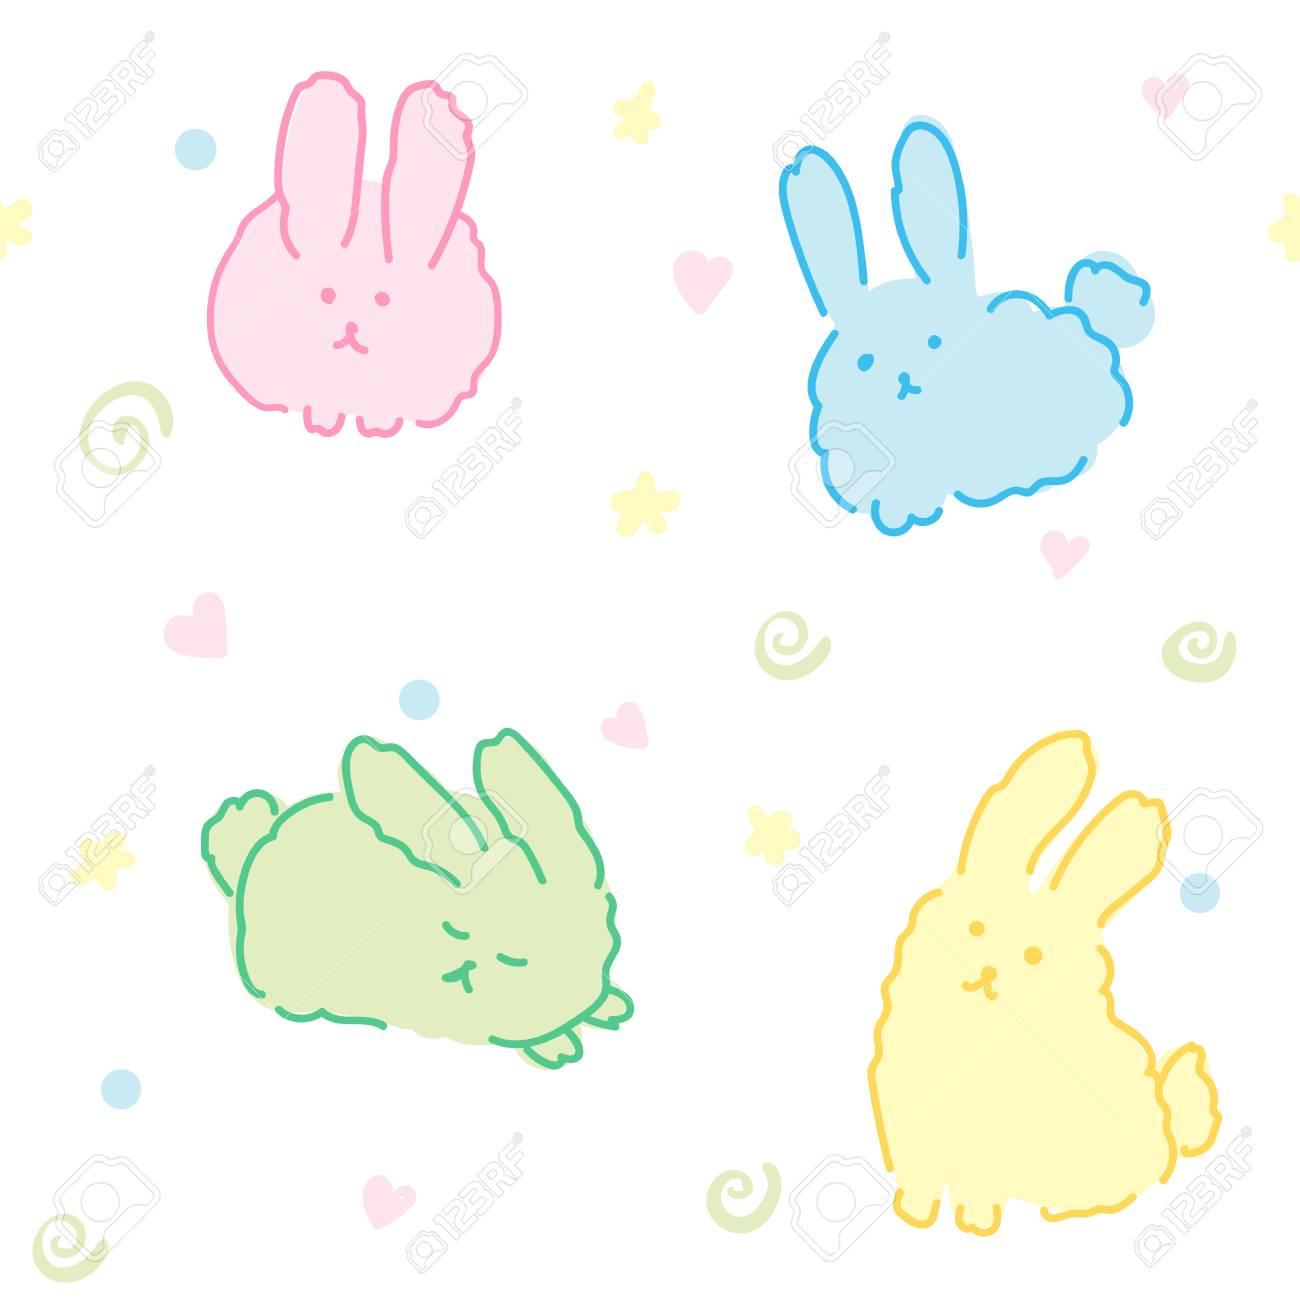 Fluffy Bunnies Wallpaper Seamless Pattern Cute Rabbits Kawaii Animals In White